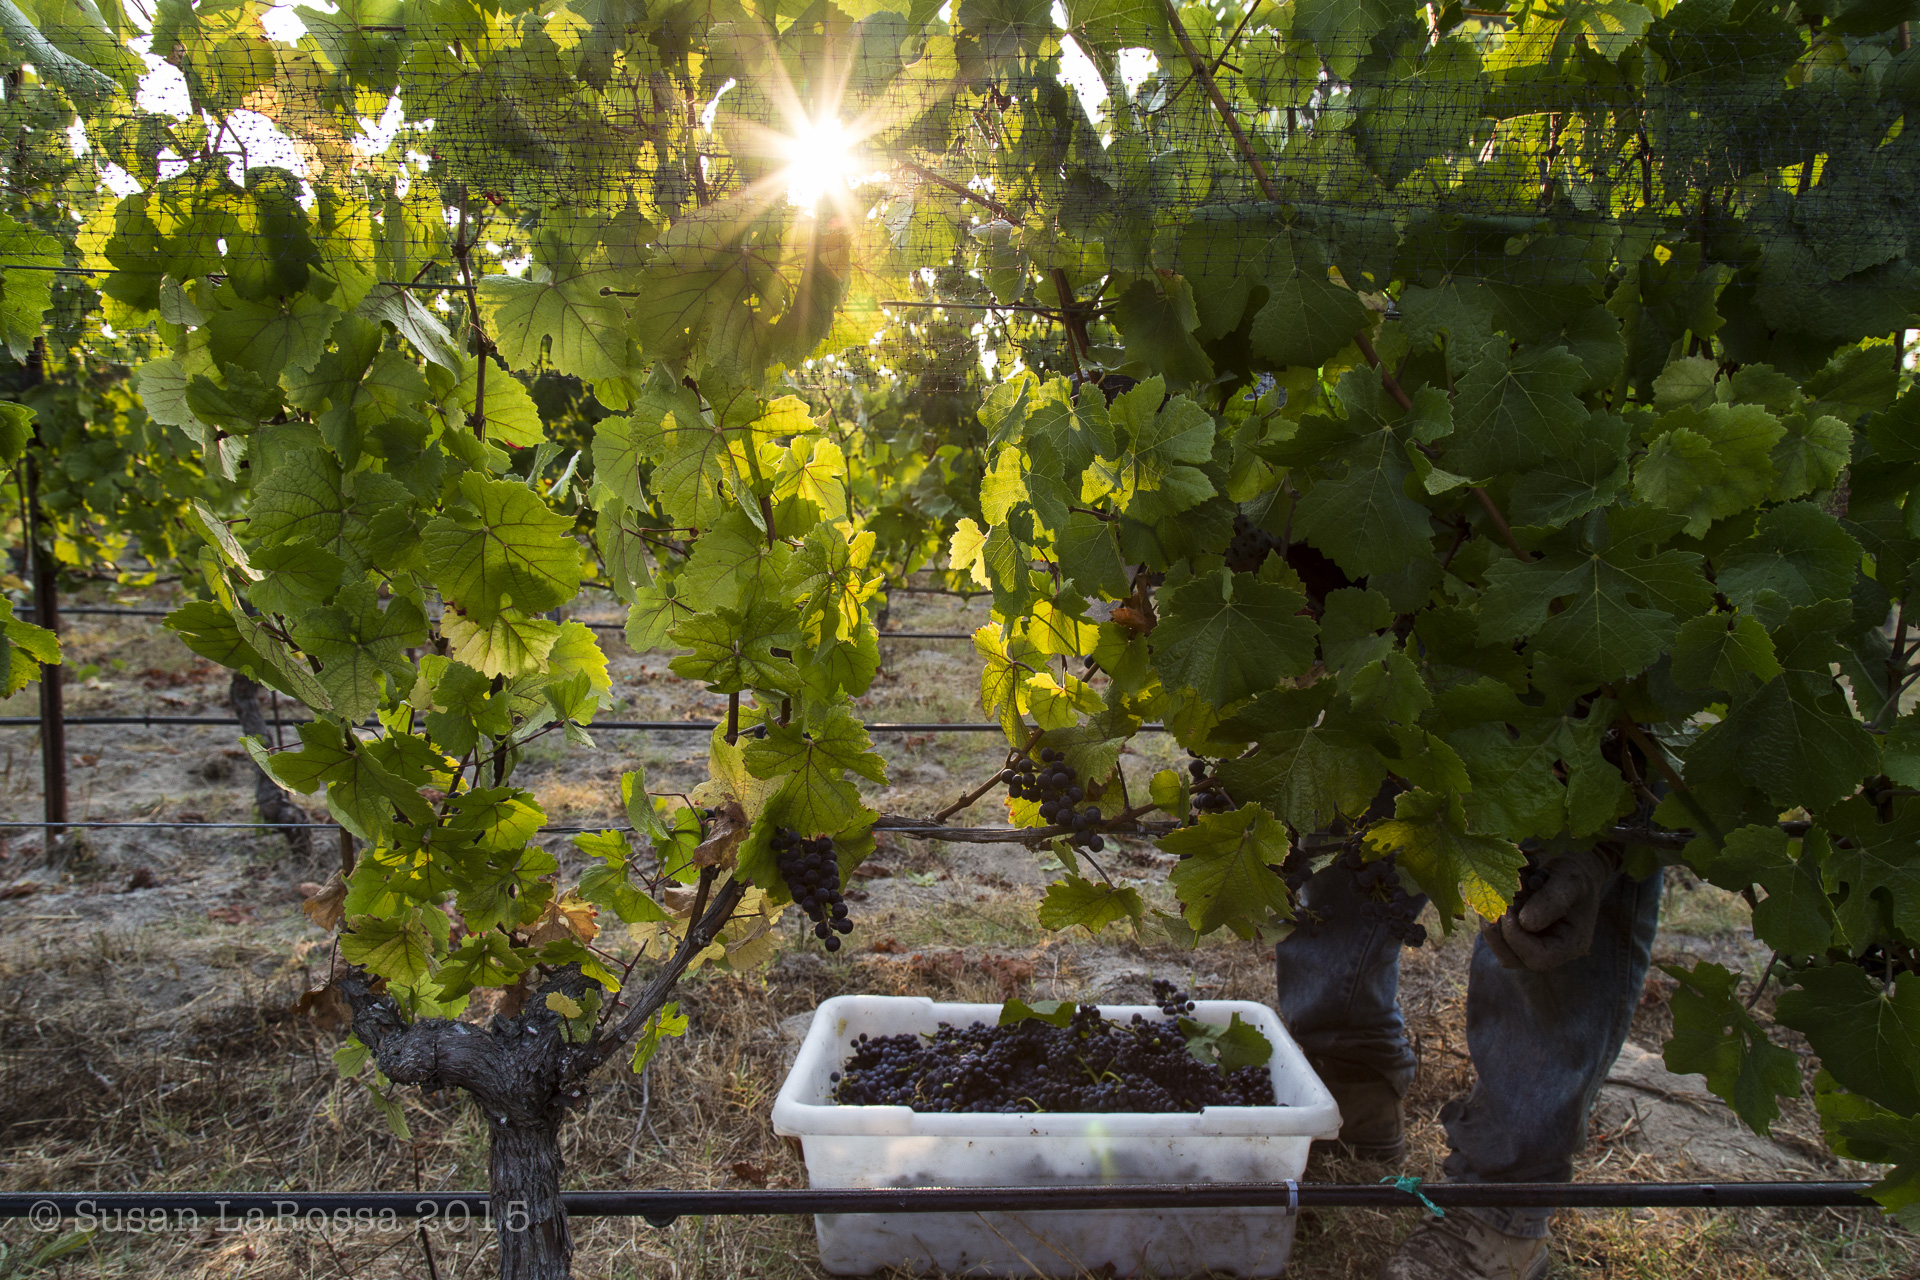 Picking Alberigi Vineyard, August 15, 2015